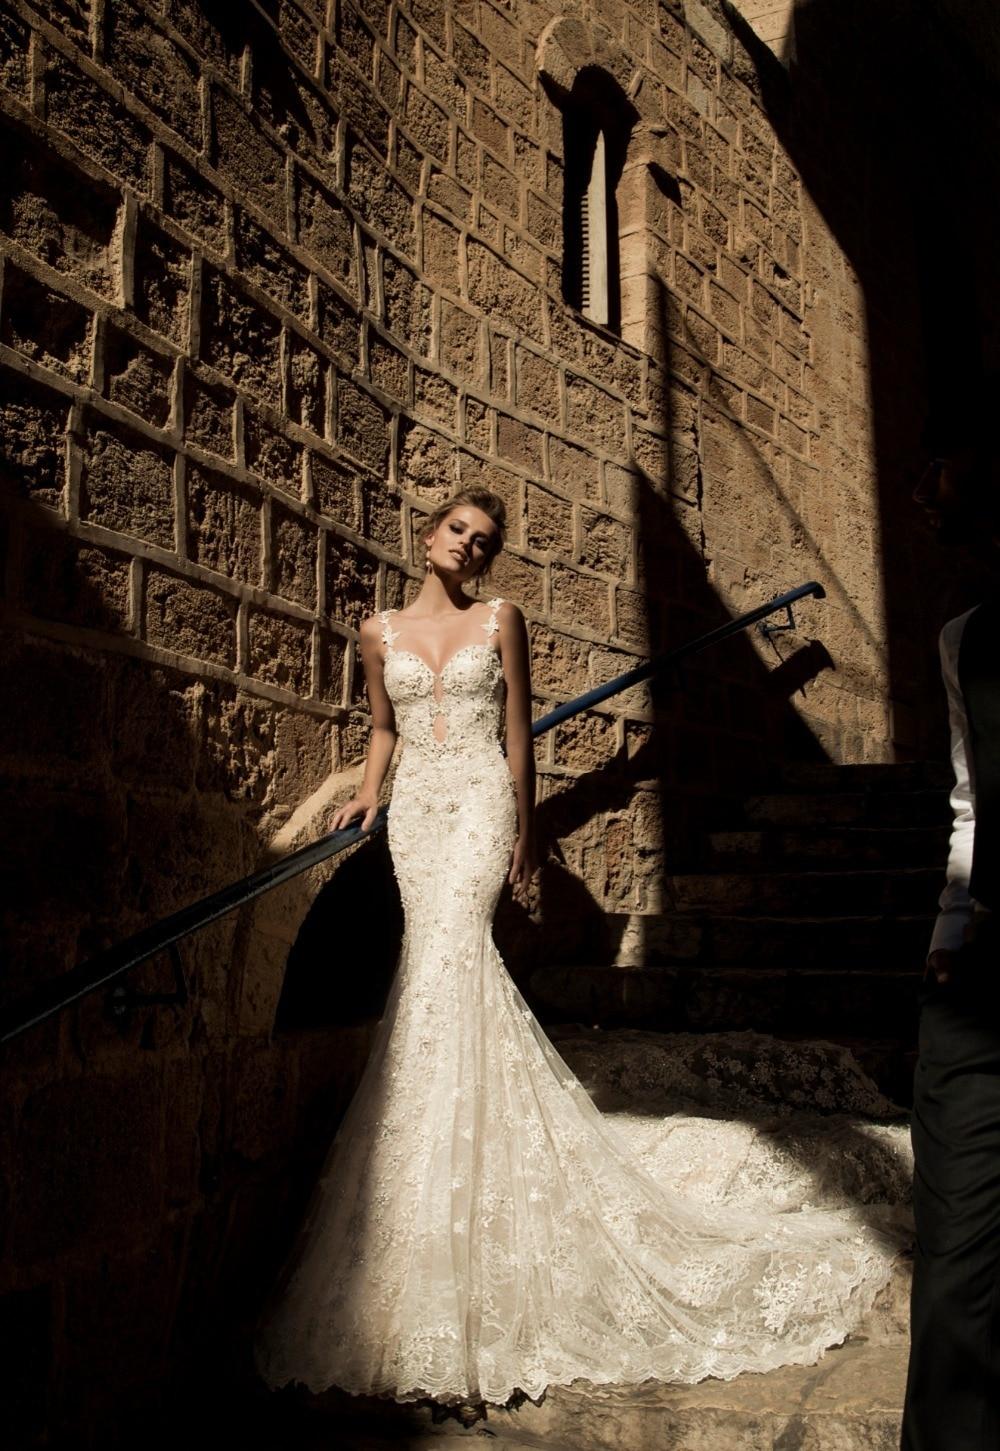 Spaghetti Strap Exquisite Beaded Applique Sexy Backless Lace 2018 Mermaid Vestido De Noiva Casamento Mother Of The Bride Dresses